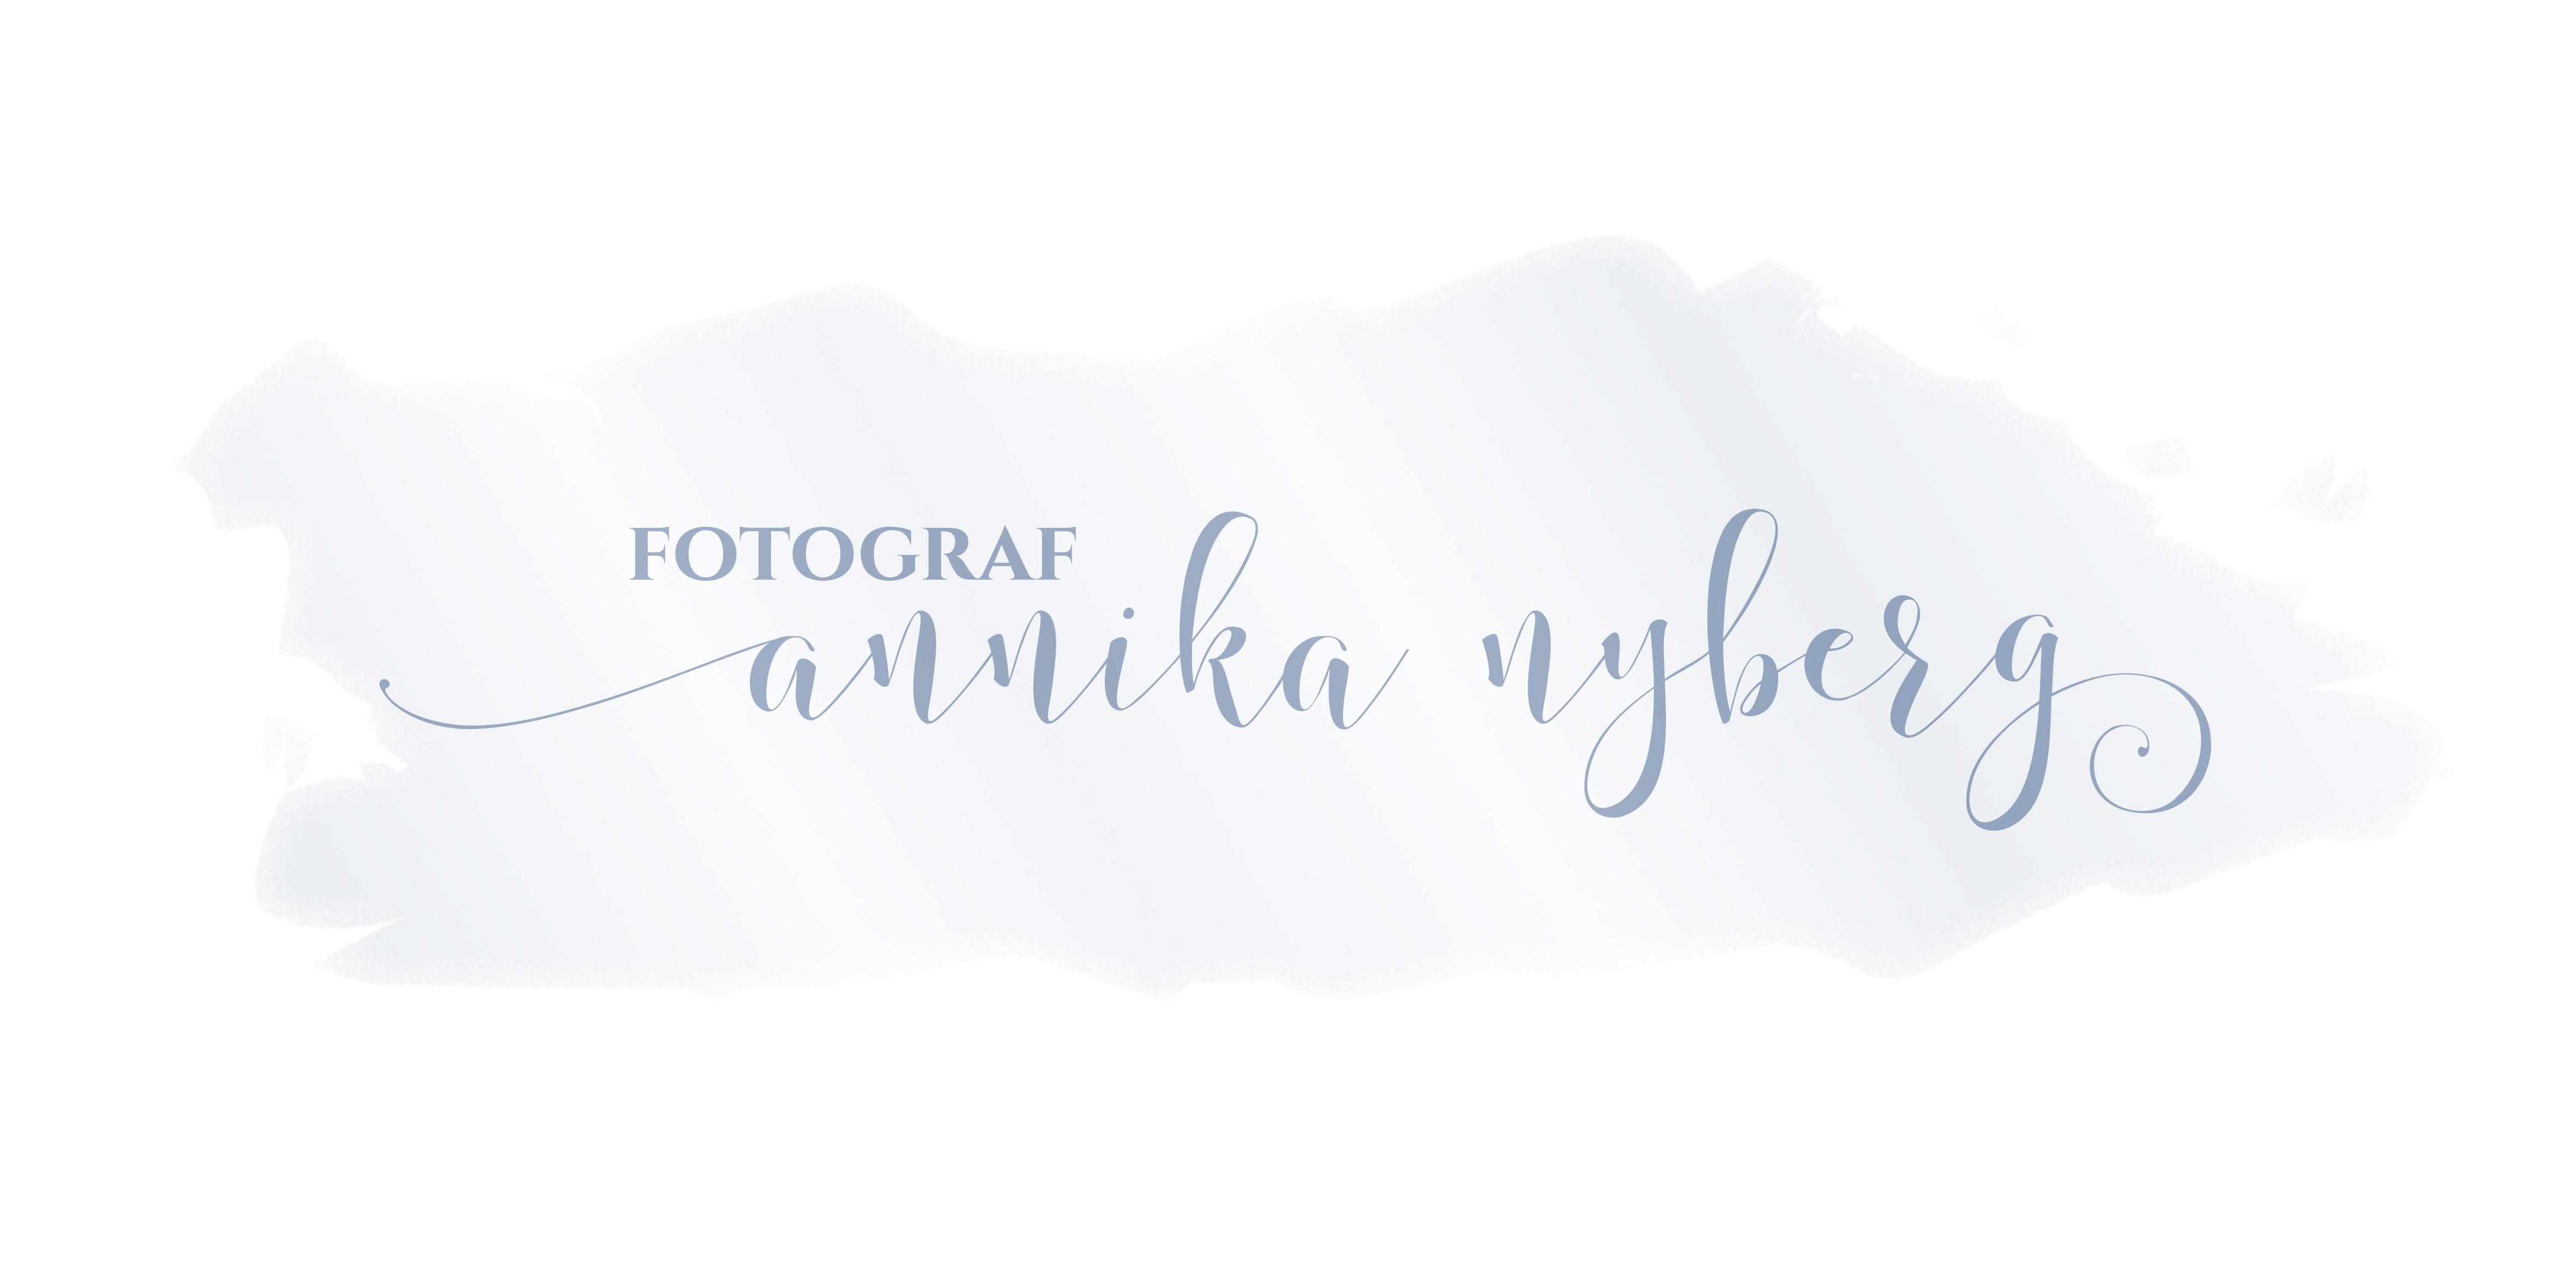 Fotograf Annika Nyberg